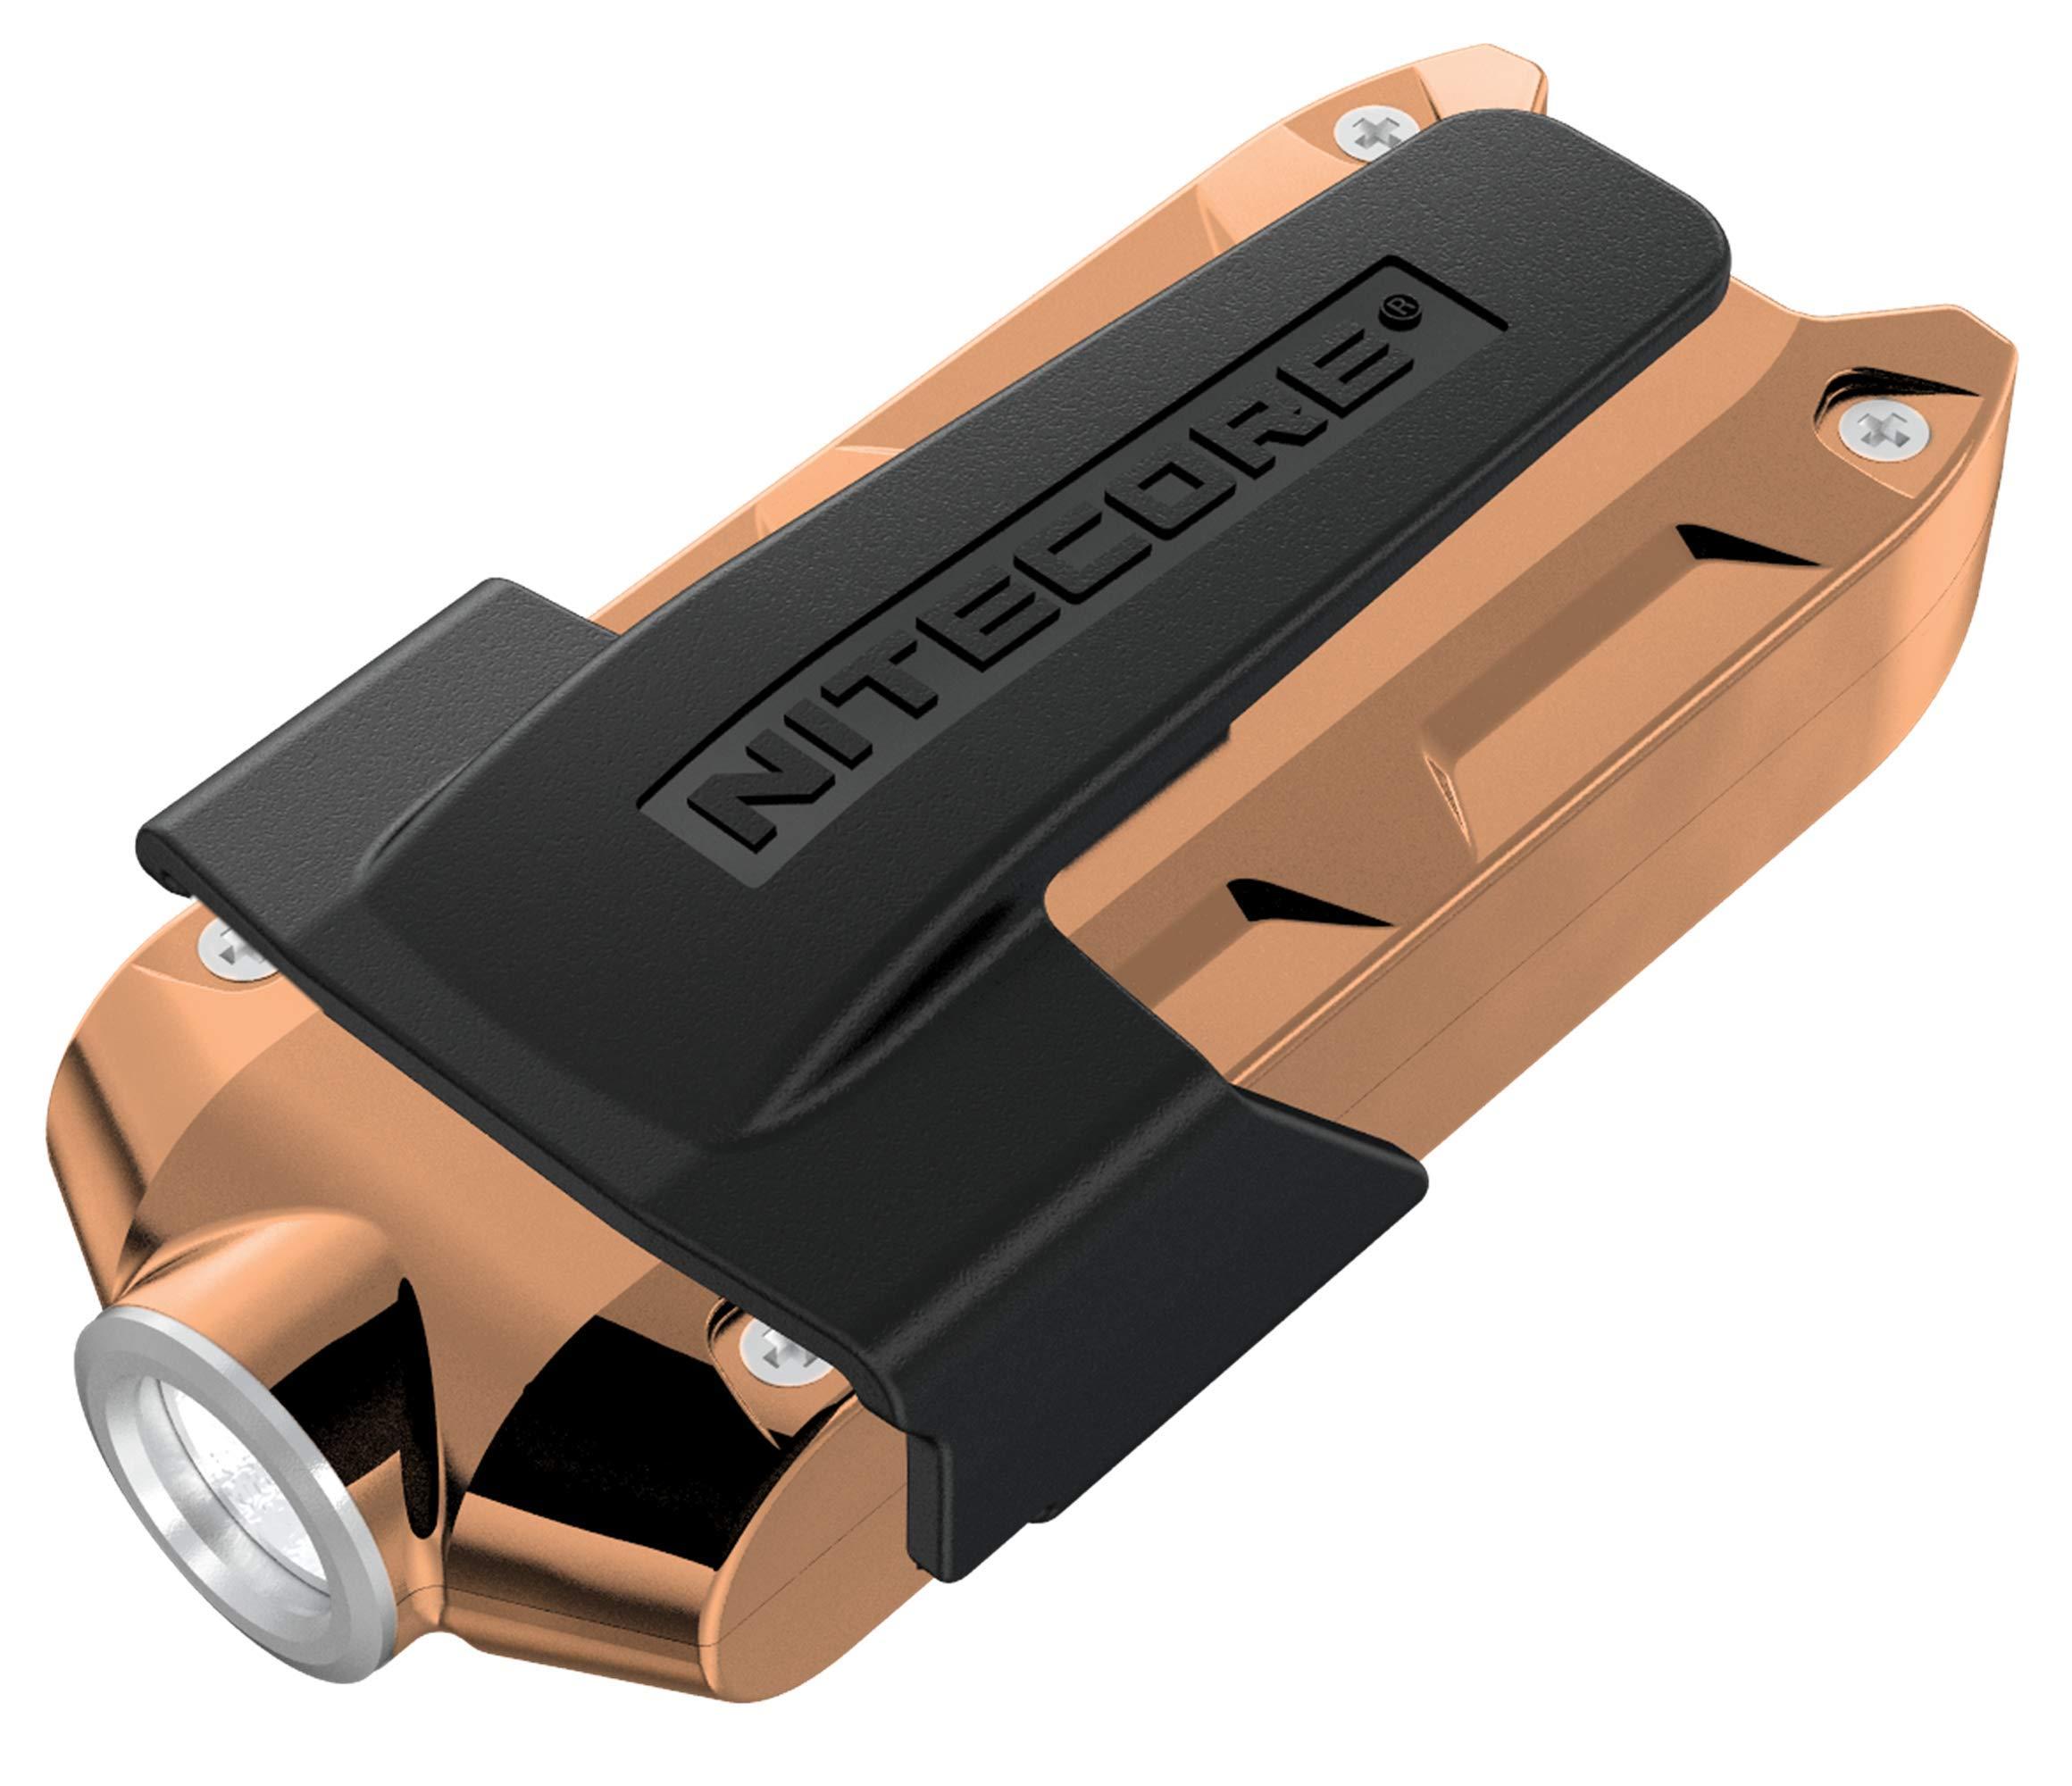 Linternas : Nitecore Tip 360 Lumens Light USB Recharg. Beige